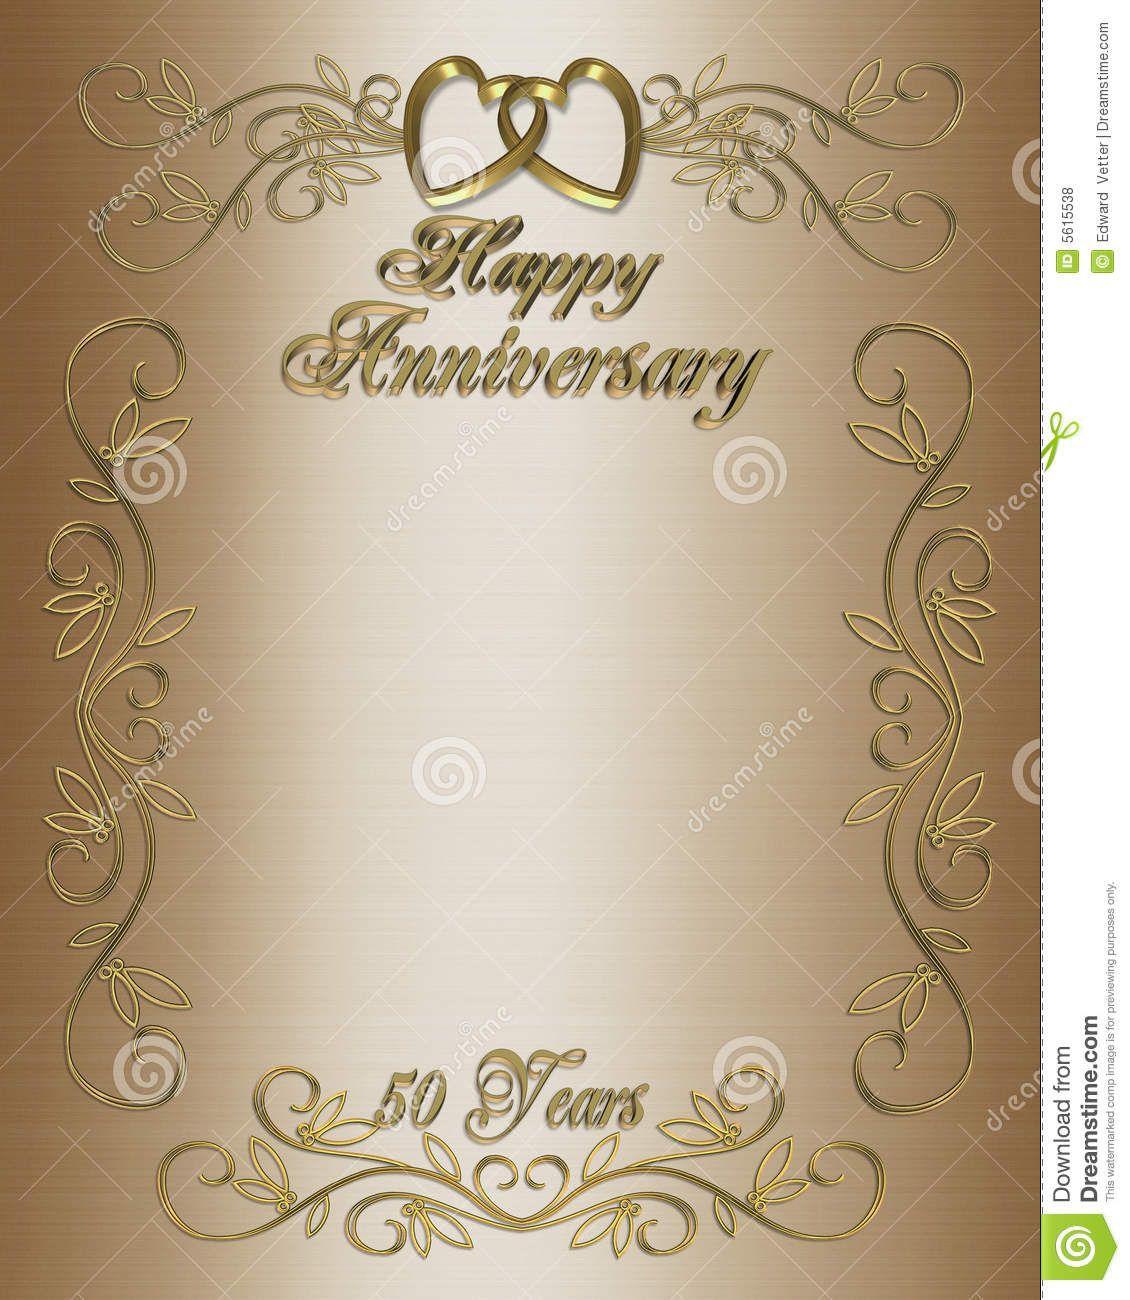 005 Dreaded 50th Wedding Anniversary Invitation Template Free High Def  Download Golden Microsoft WordFull